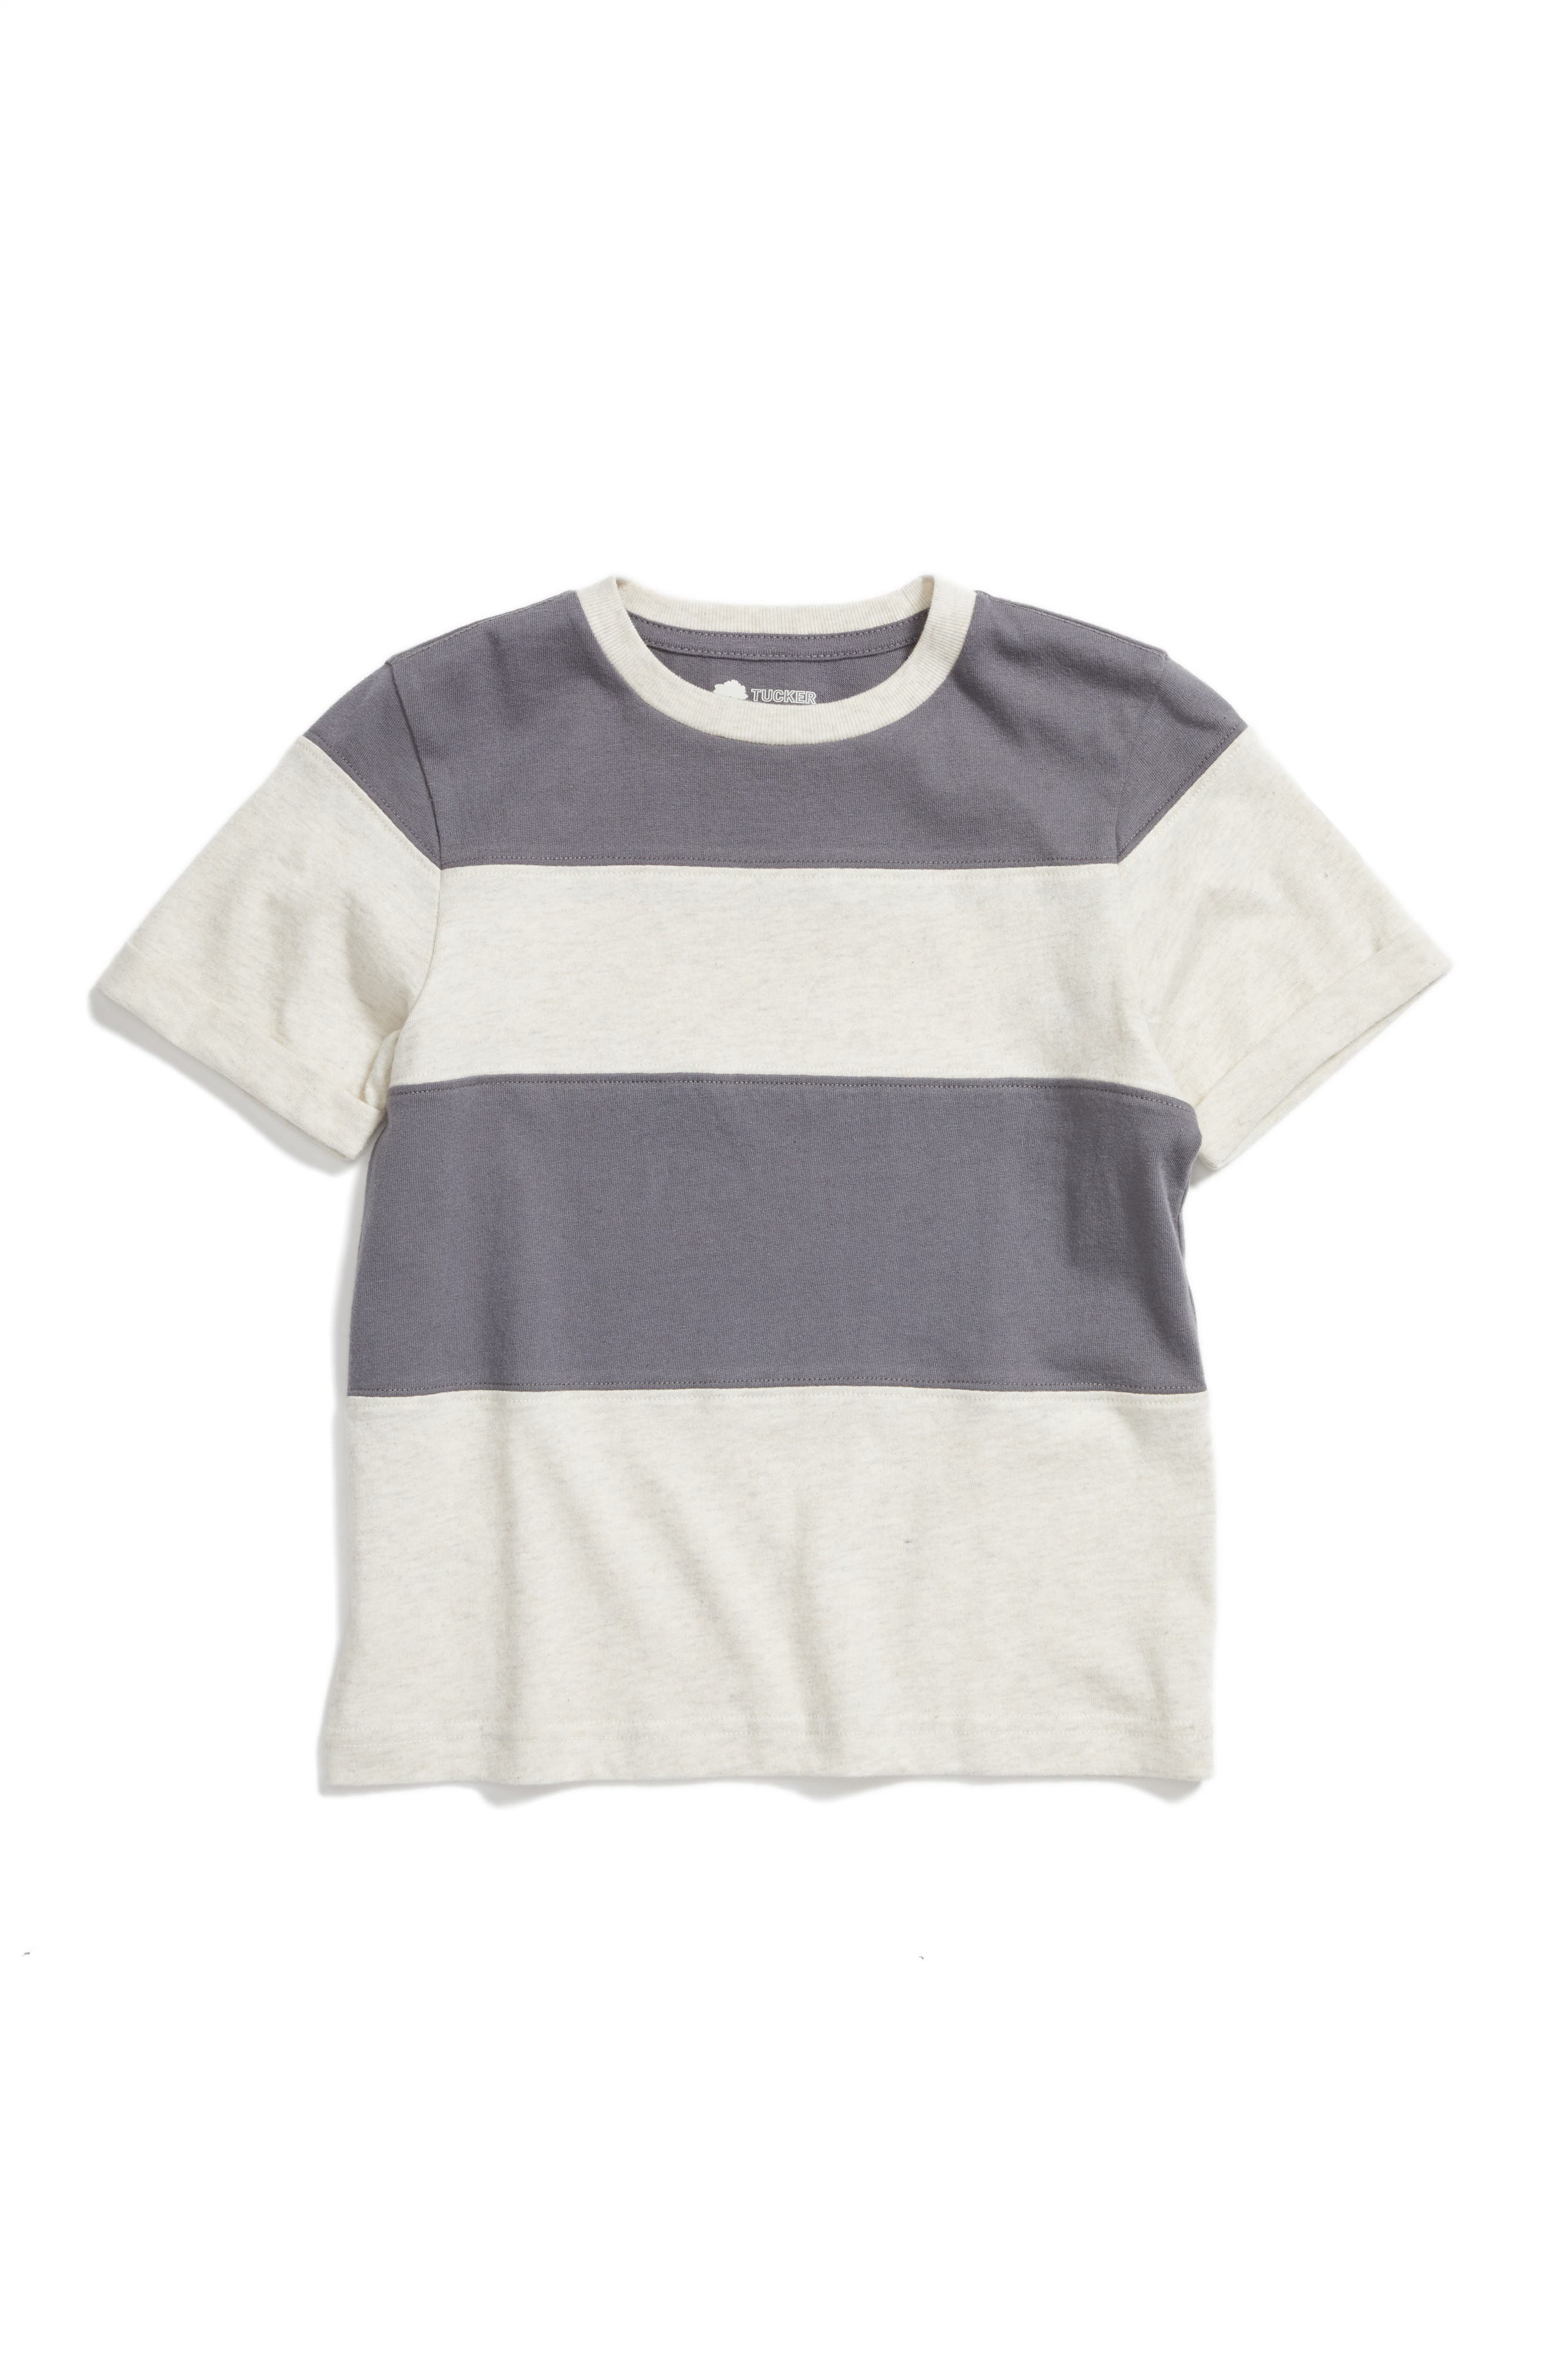 Tucker + Tate Pieced Colorblock T-Shirt (Toddler Boys & Little Boys)